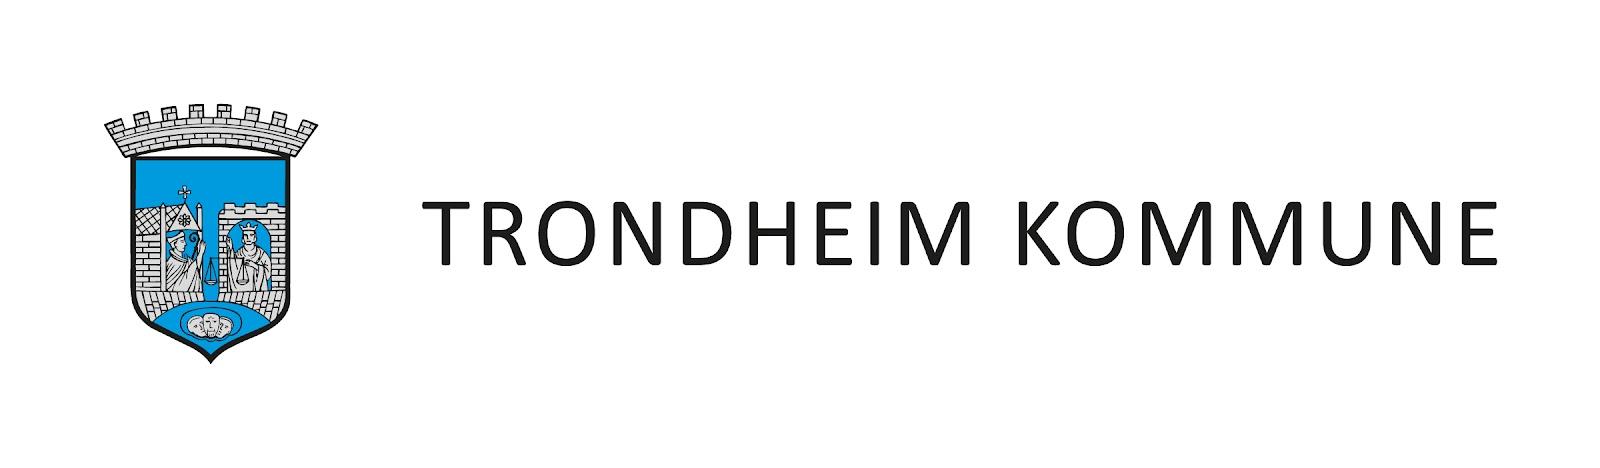 Trondheim kommune logo RGB 600dpi-01.jpg